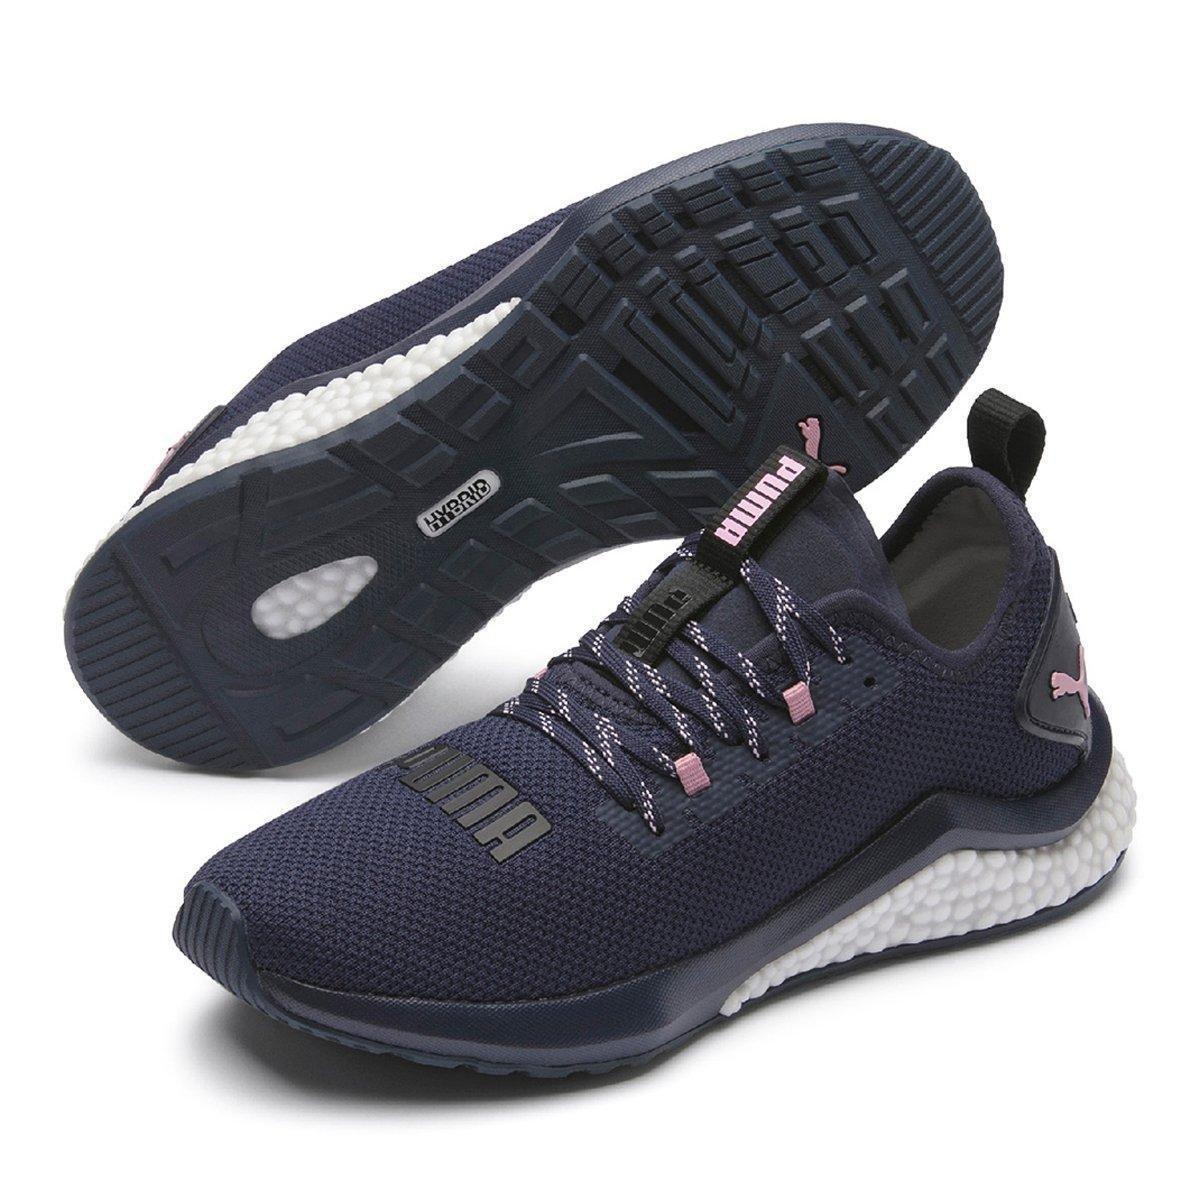 2aeedfb3ac943 FornecedorNetshoes. Tênis Puma Hybrid NX Wns Feminino